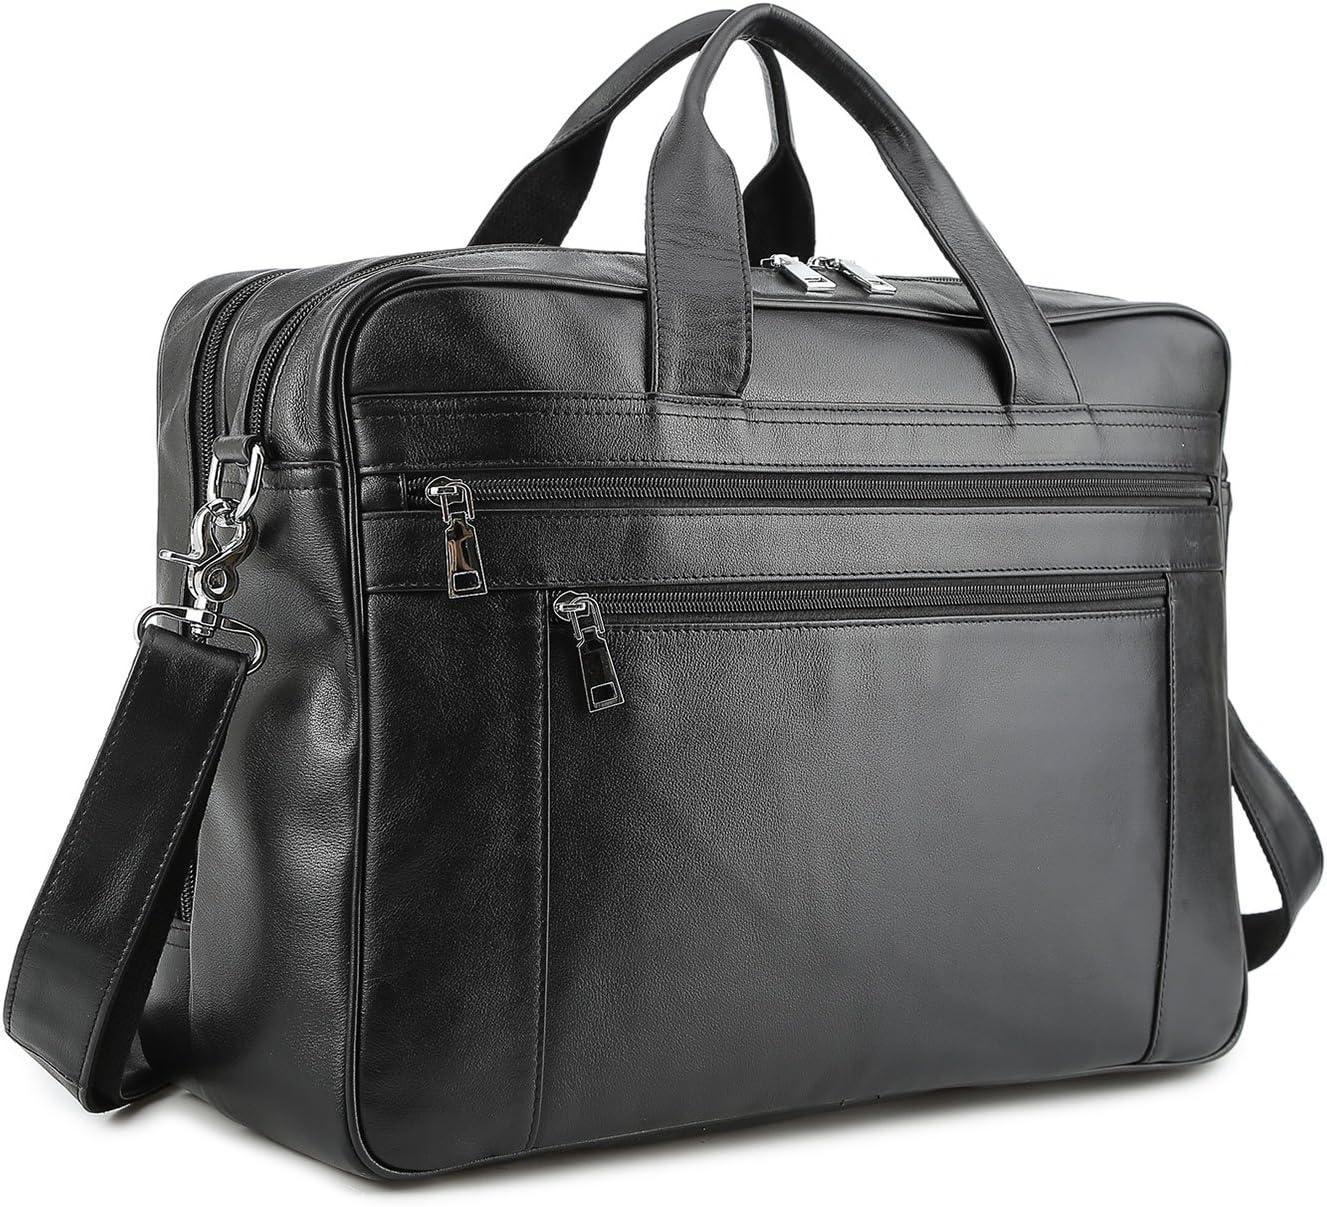 BAIGIO Mens Briefcase Messenger Bags Large, Black-17 Inches Napa Leather Laptop Bags Multi-Pocket Business Work Shoulder Bag